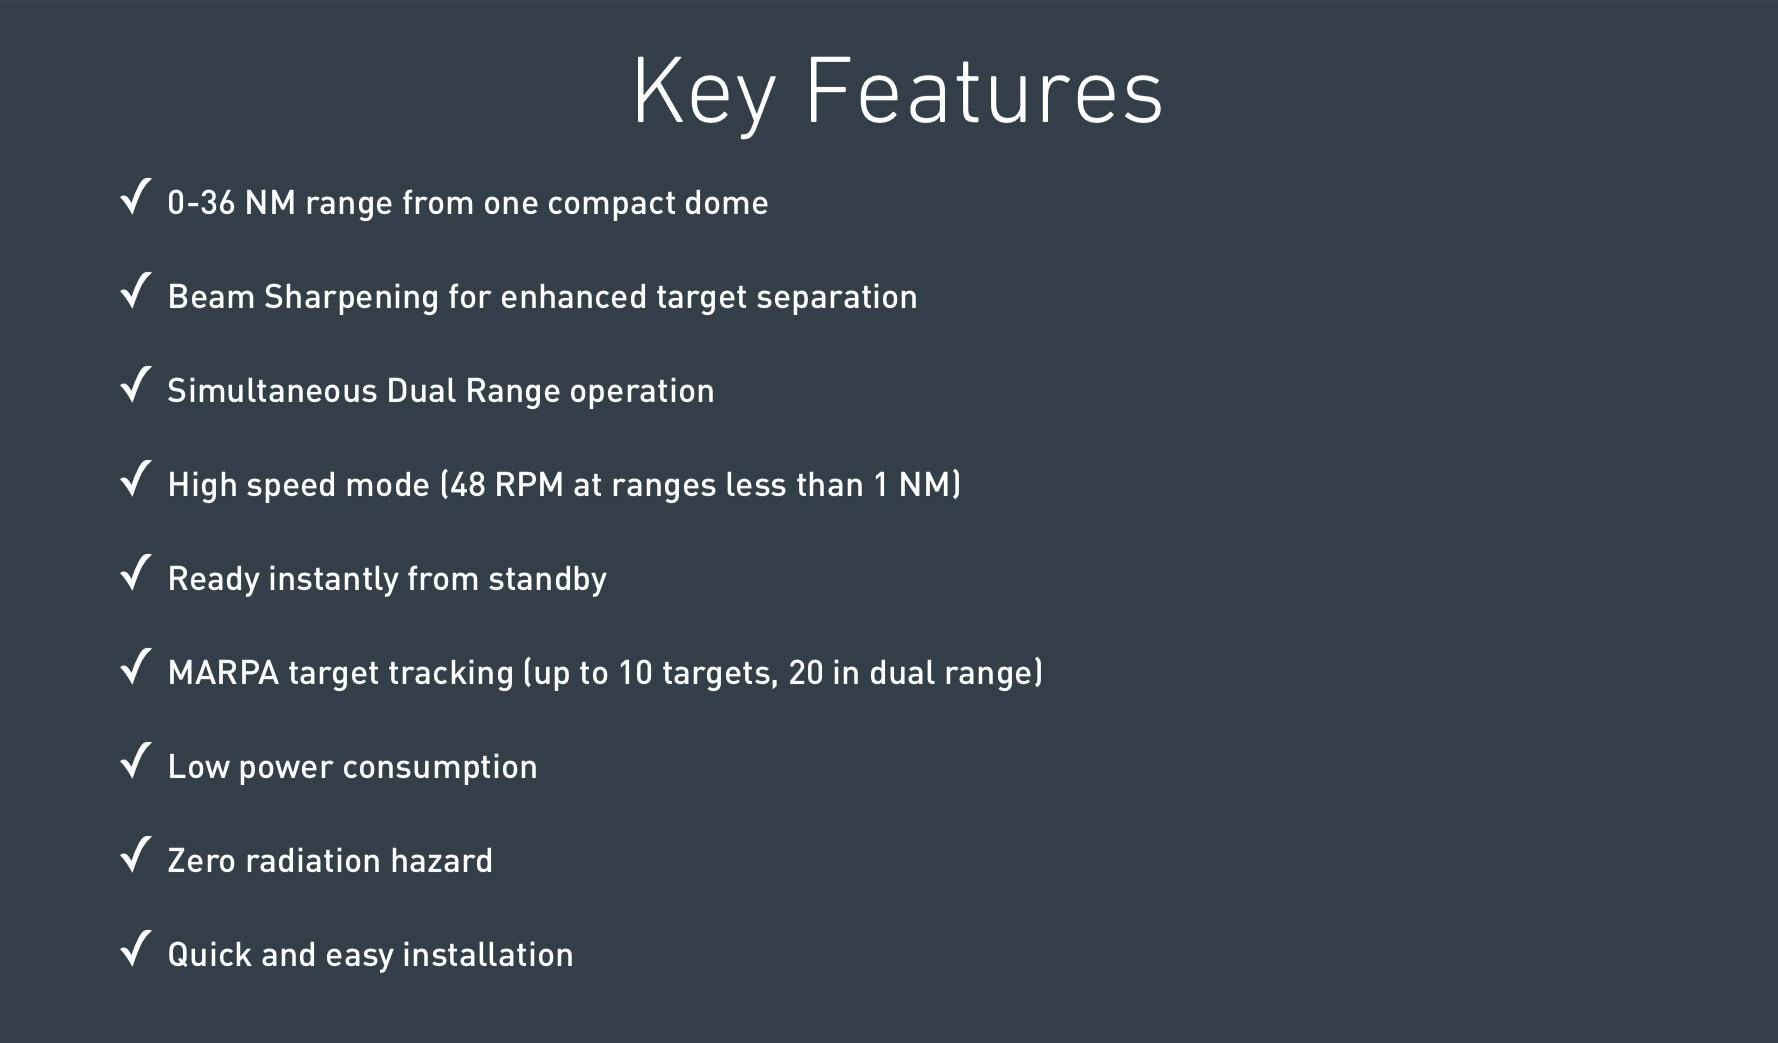 Características radar Simrad 4G